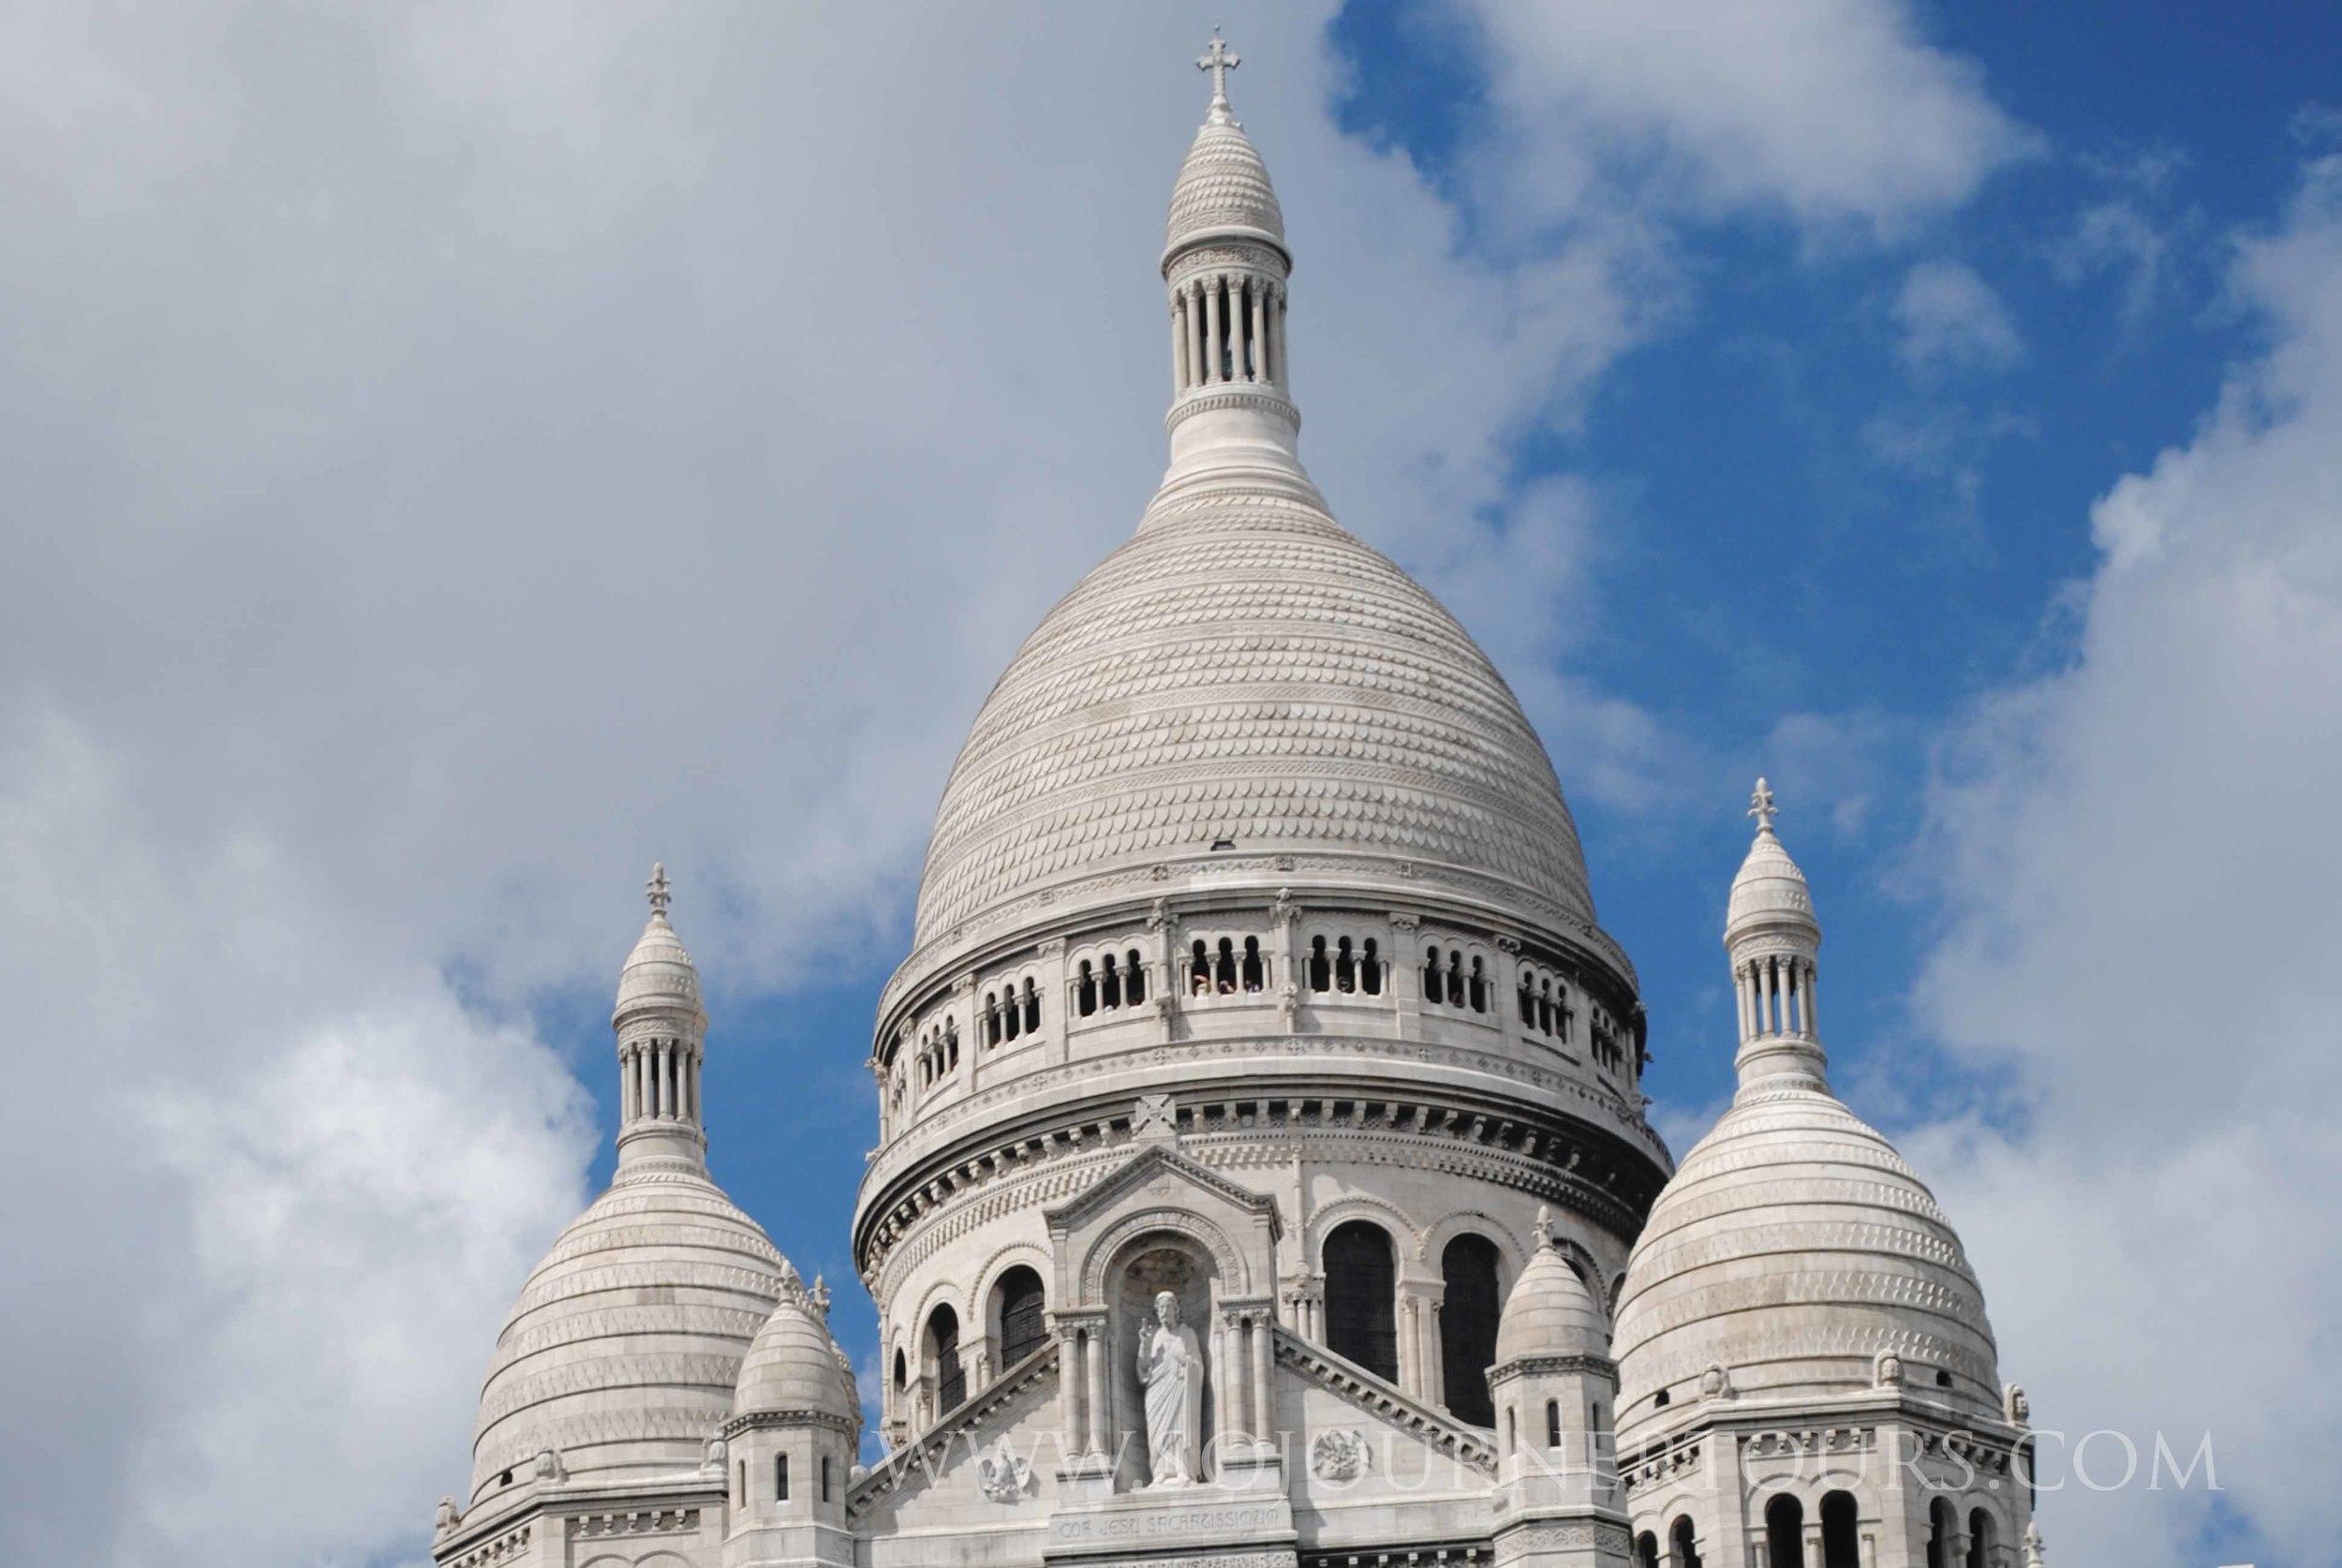 Sacre Coeur: Paris, France (Sojourner Tours)